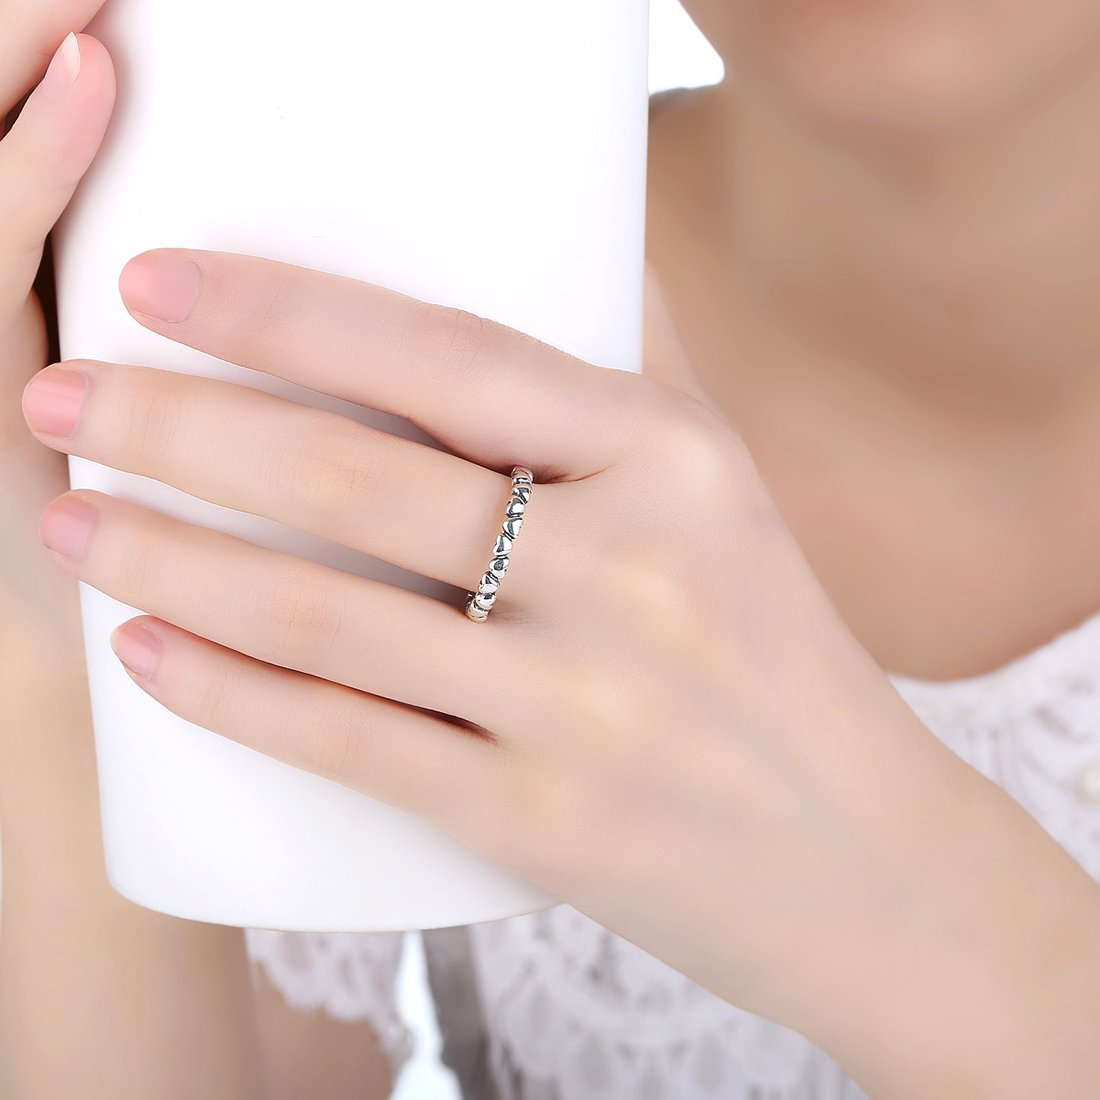 BAMOER 925 Sterling Silver Endless Love Heart Stacking Ring for Women Teen Girls Birthday Anniversary Gift Size 6-9 (7) by BAMOER (Image #6)